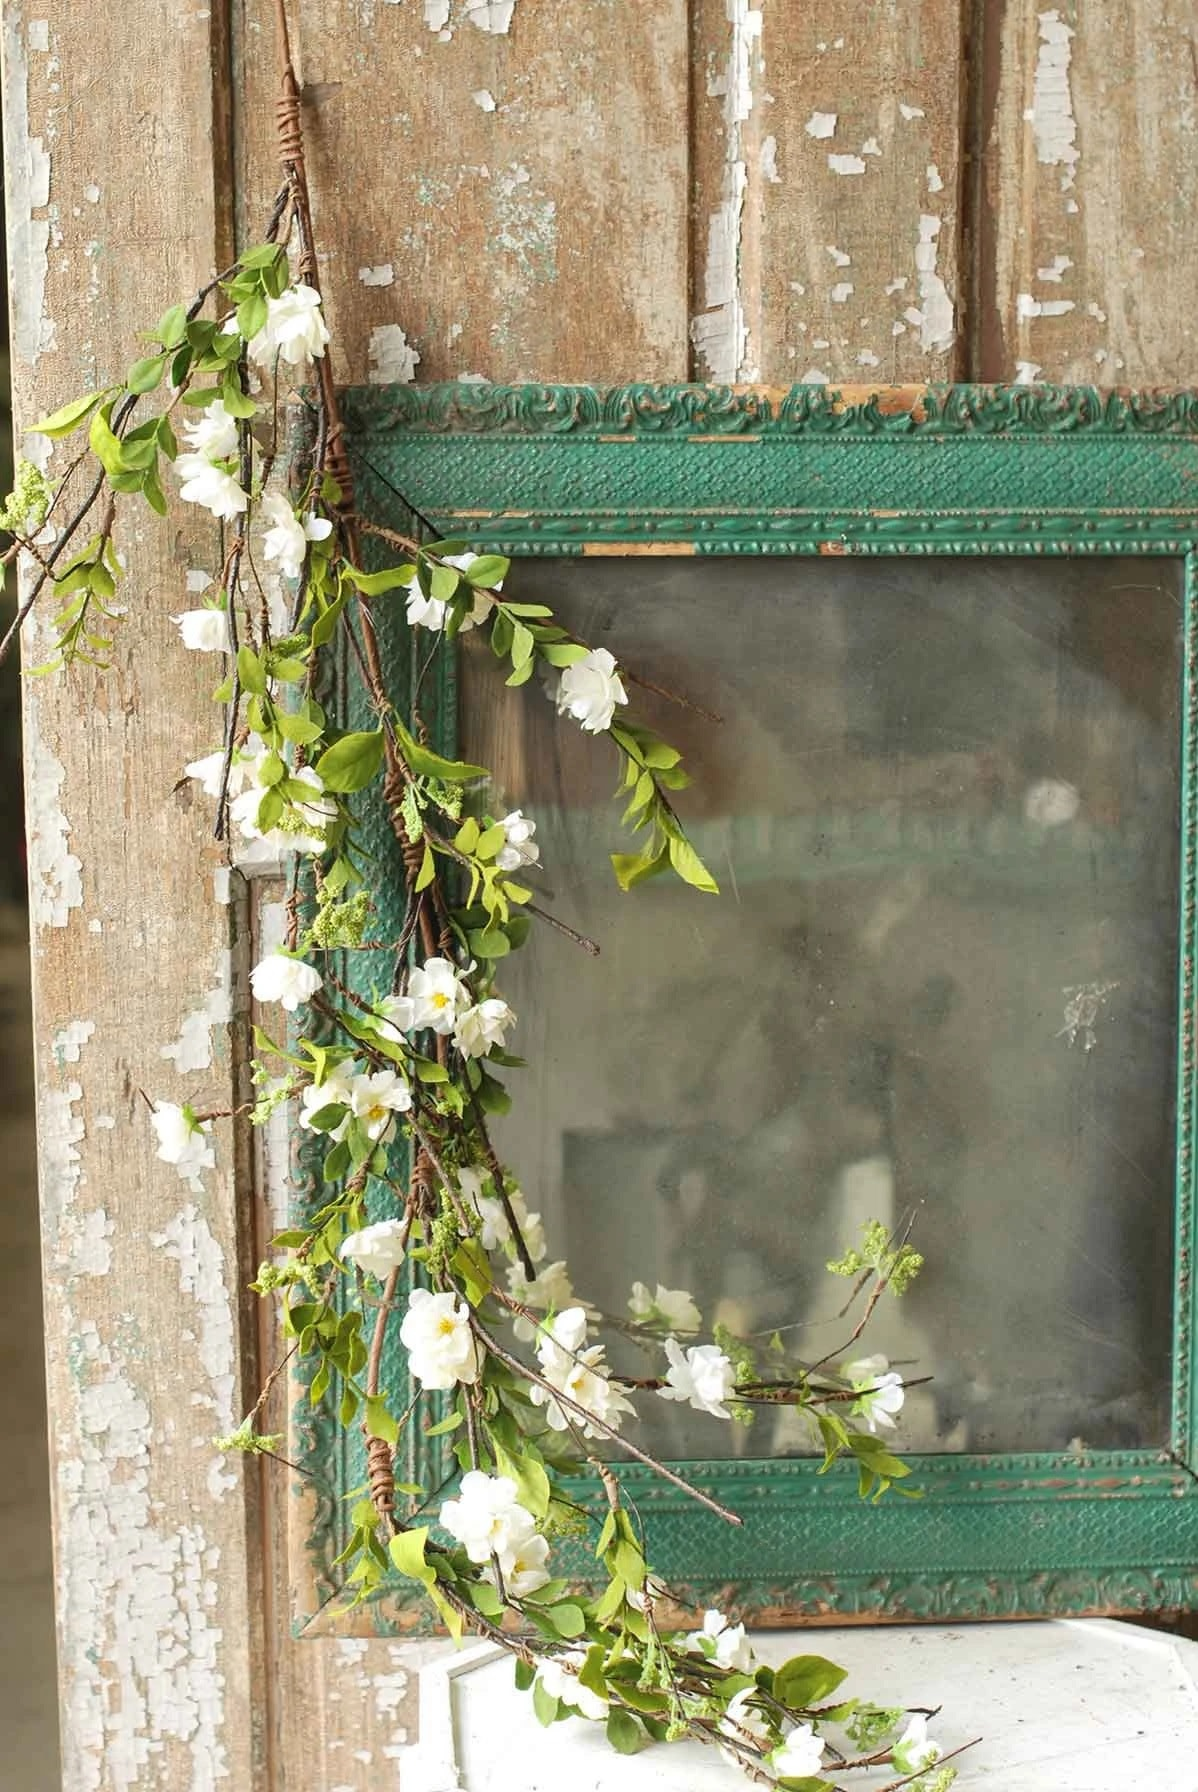 4-Ft. White Cherry Blossom Garland